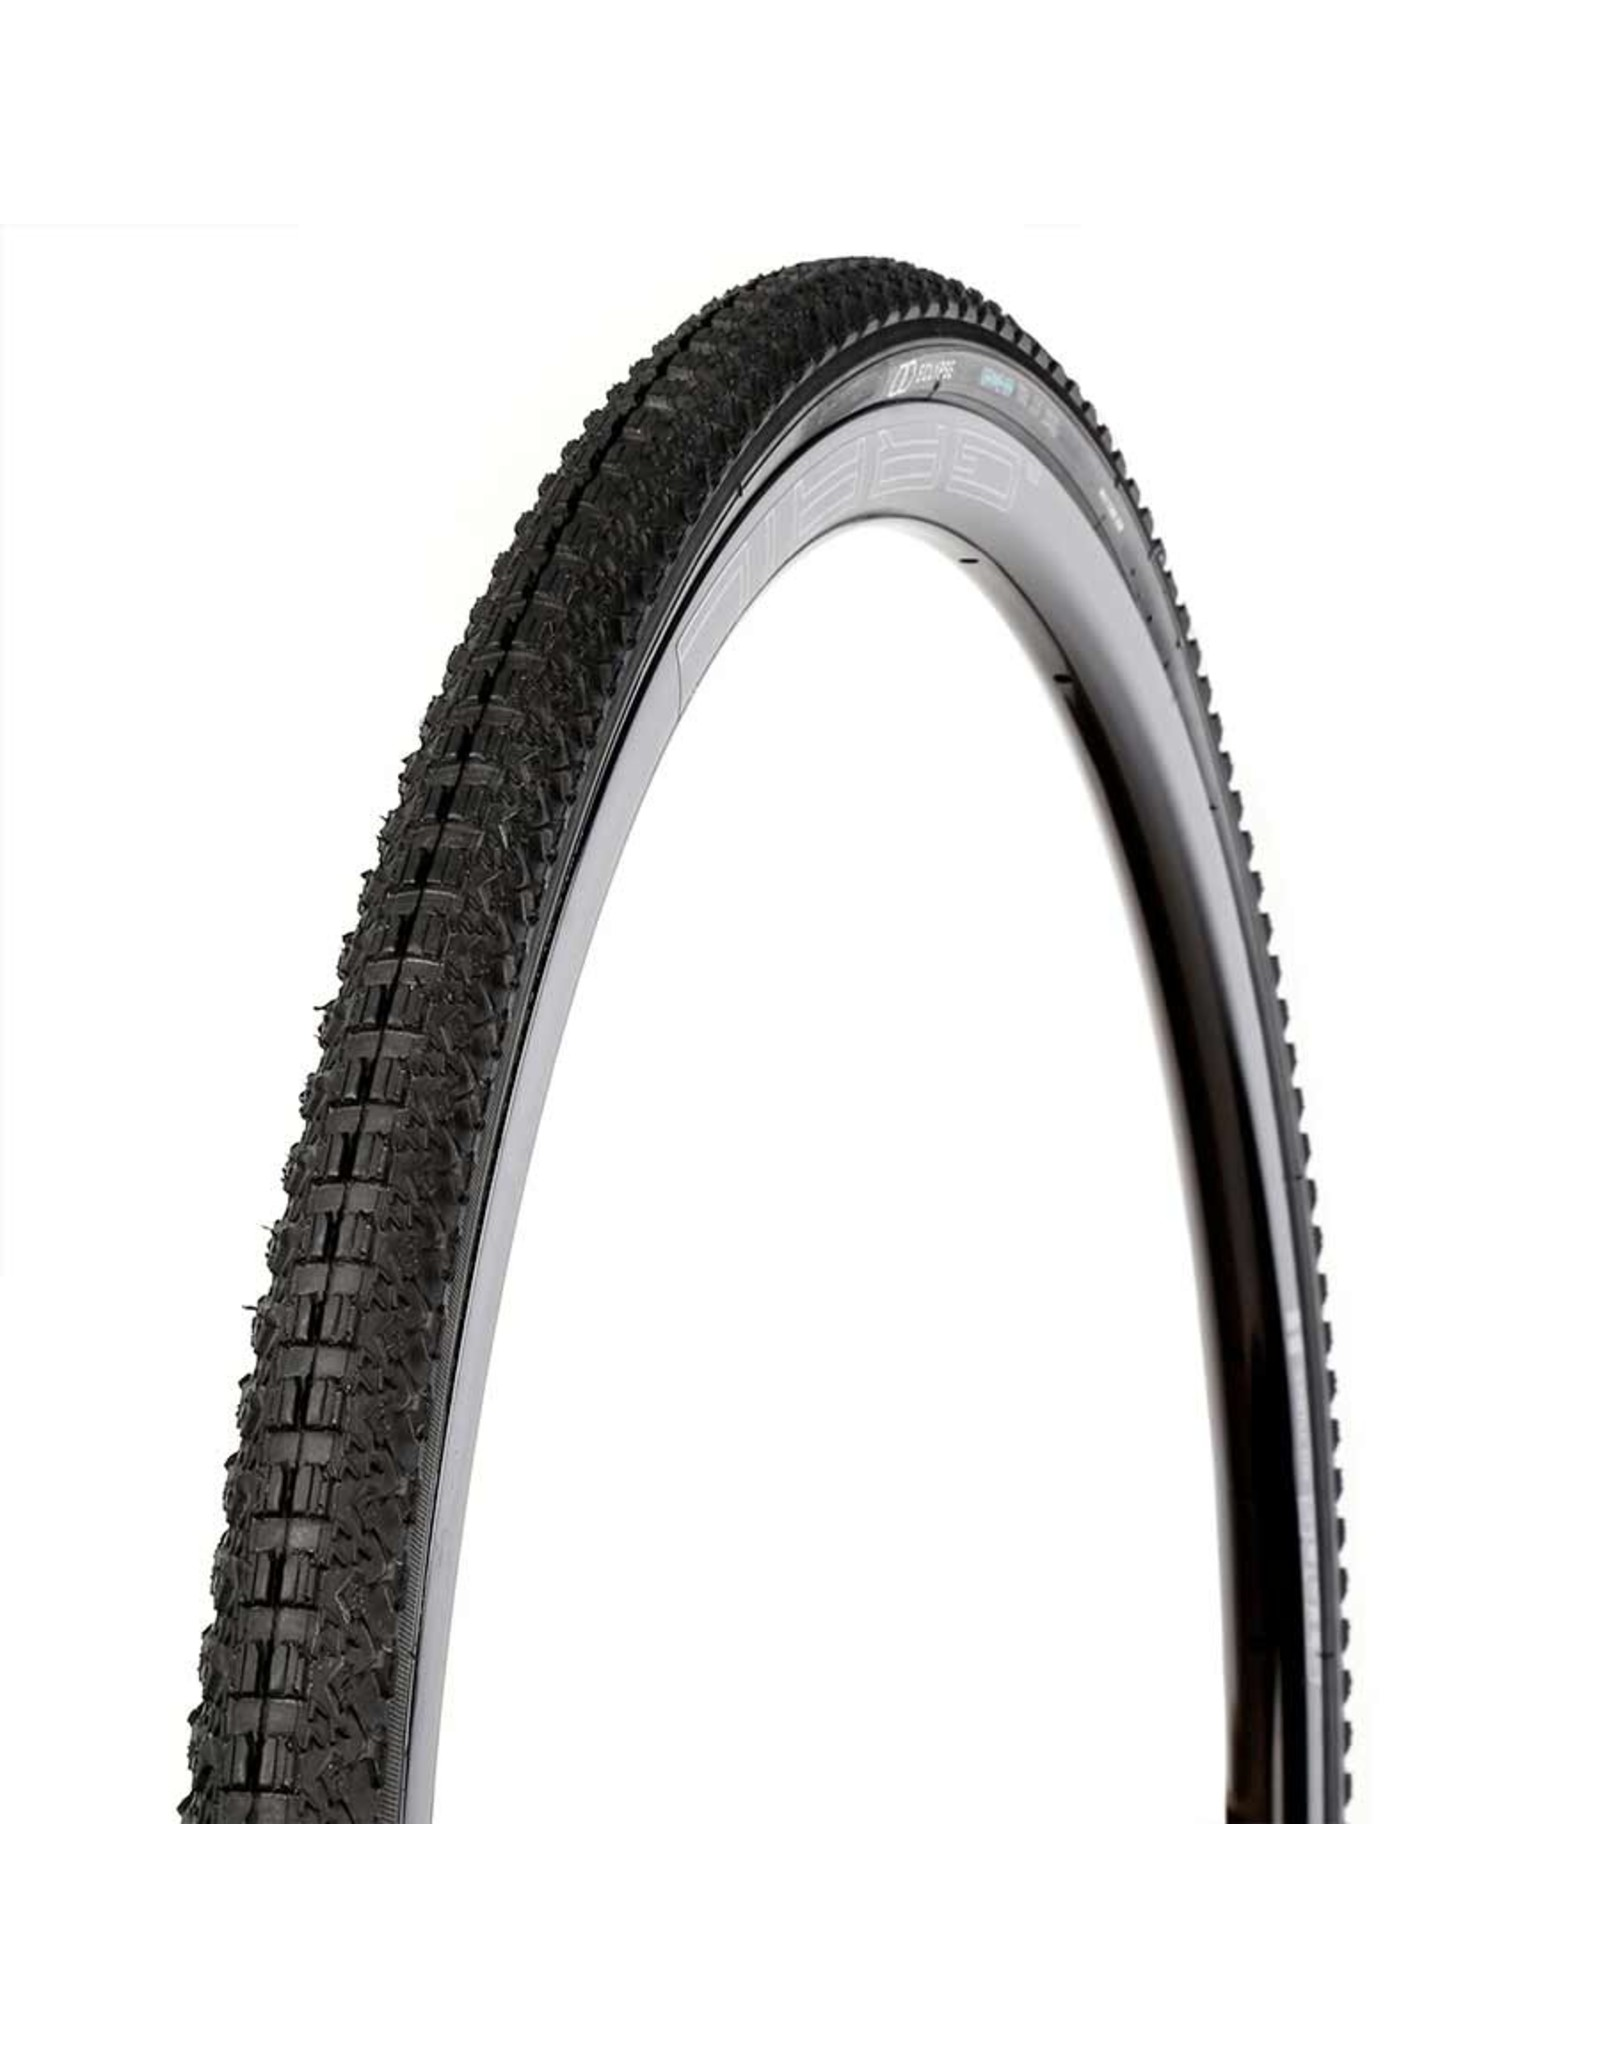 Eclypse Eclypse, Grime™, Tire, 700x33C, Folding, 60TPI, Black